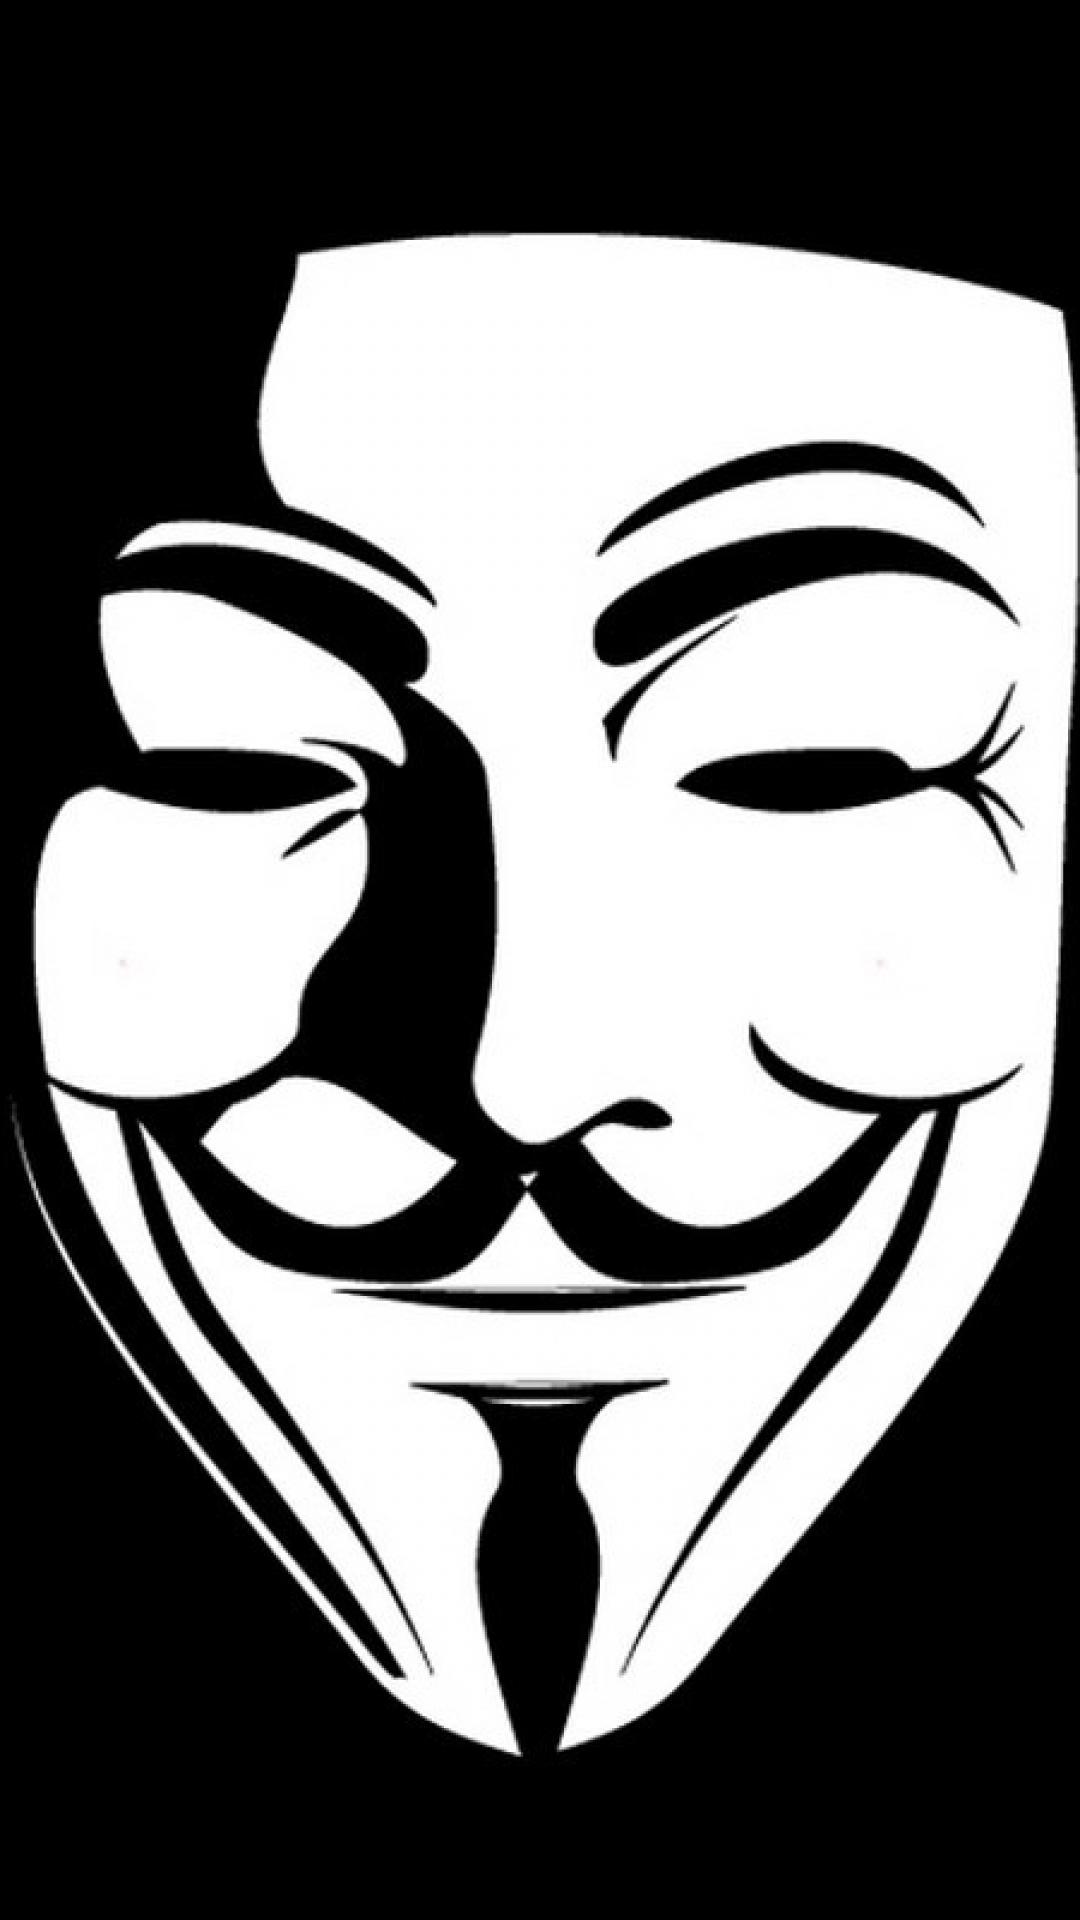 Anonymous Mask Wallpaper 3d Anonymous Wallpaper Hd For Iphone Pixelstalk Net